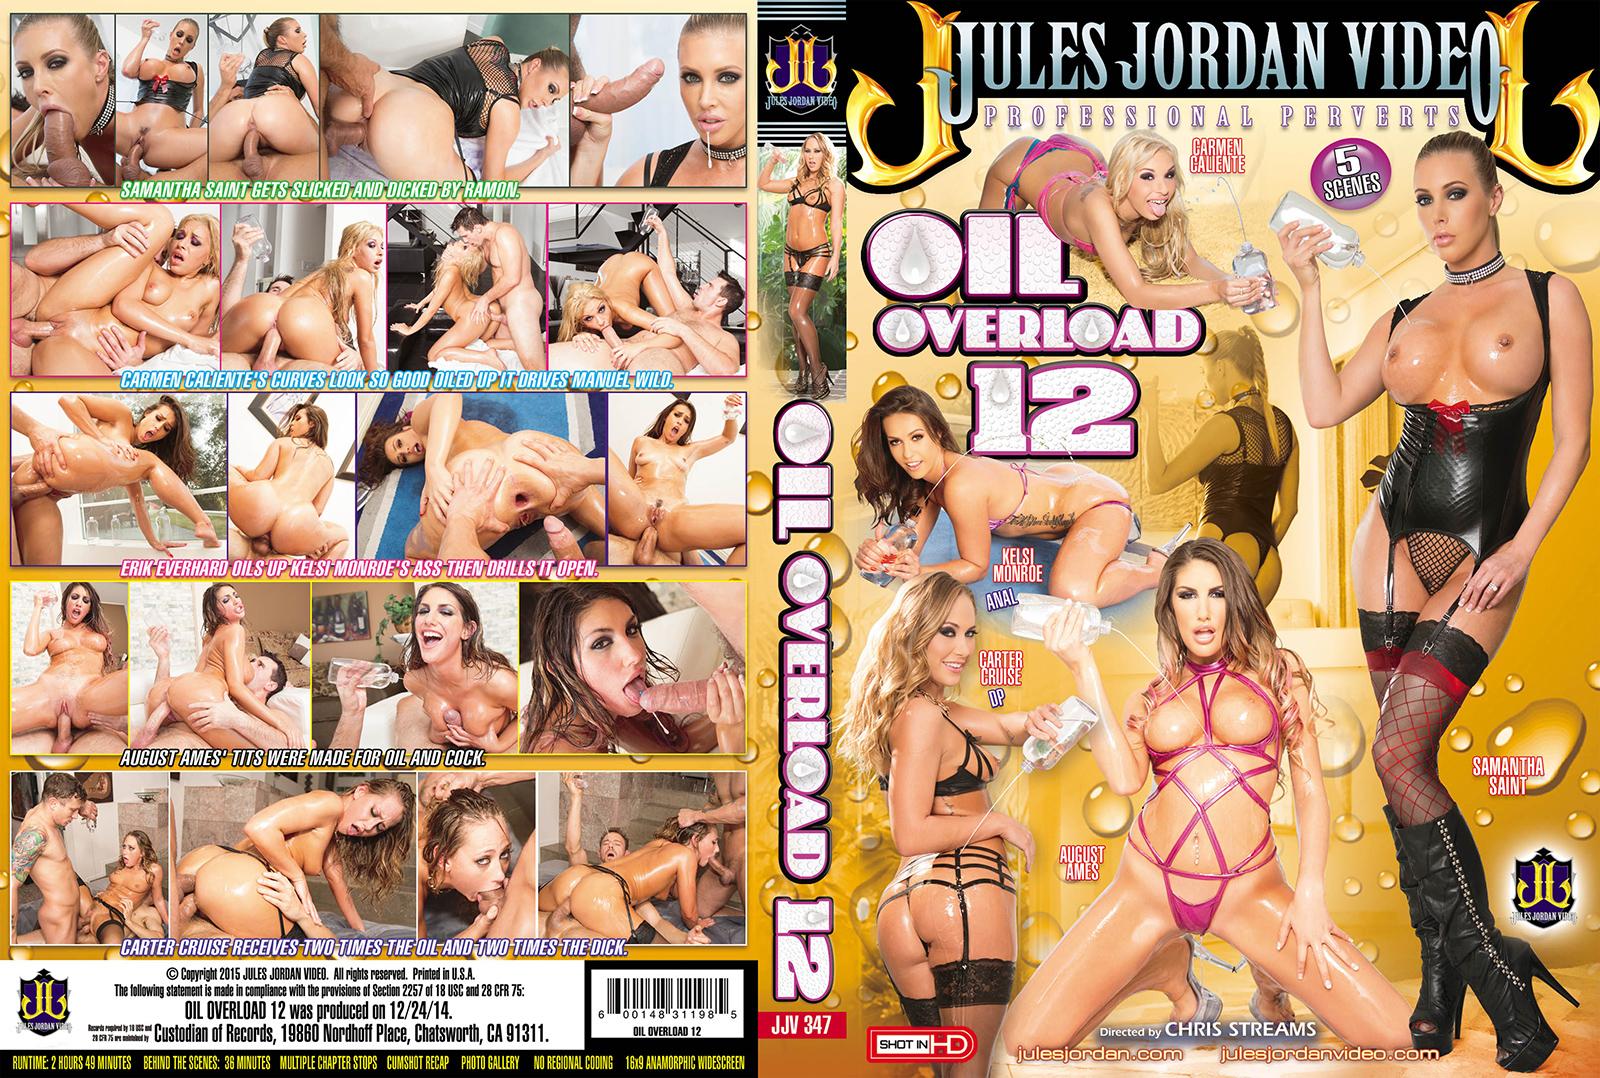 Oil Overload 12 DVD